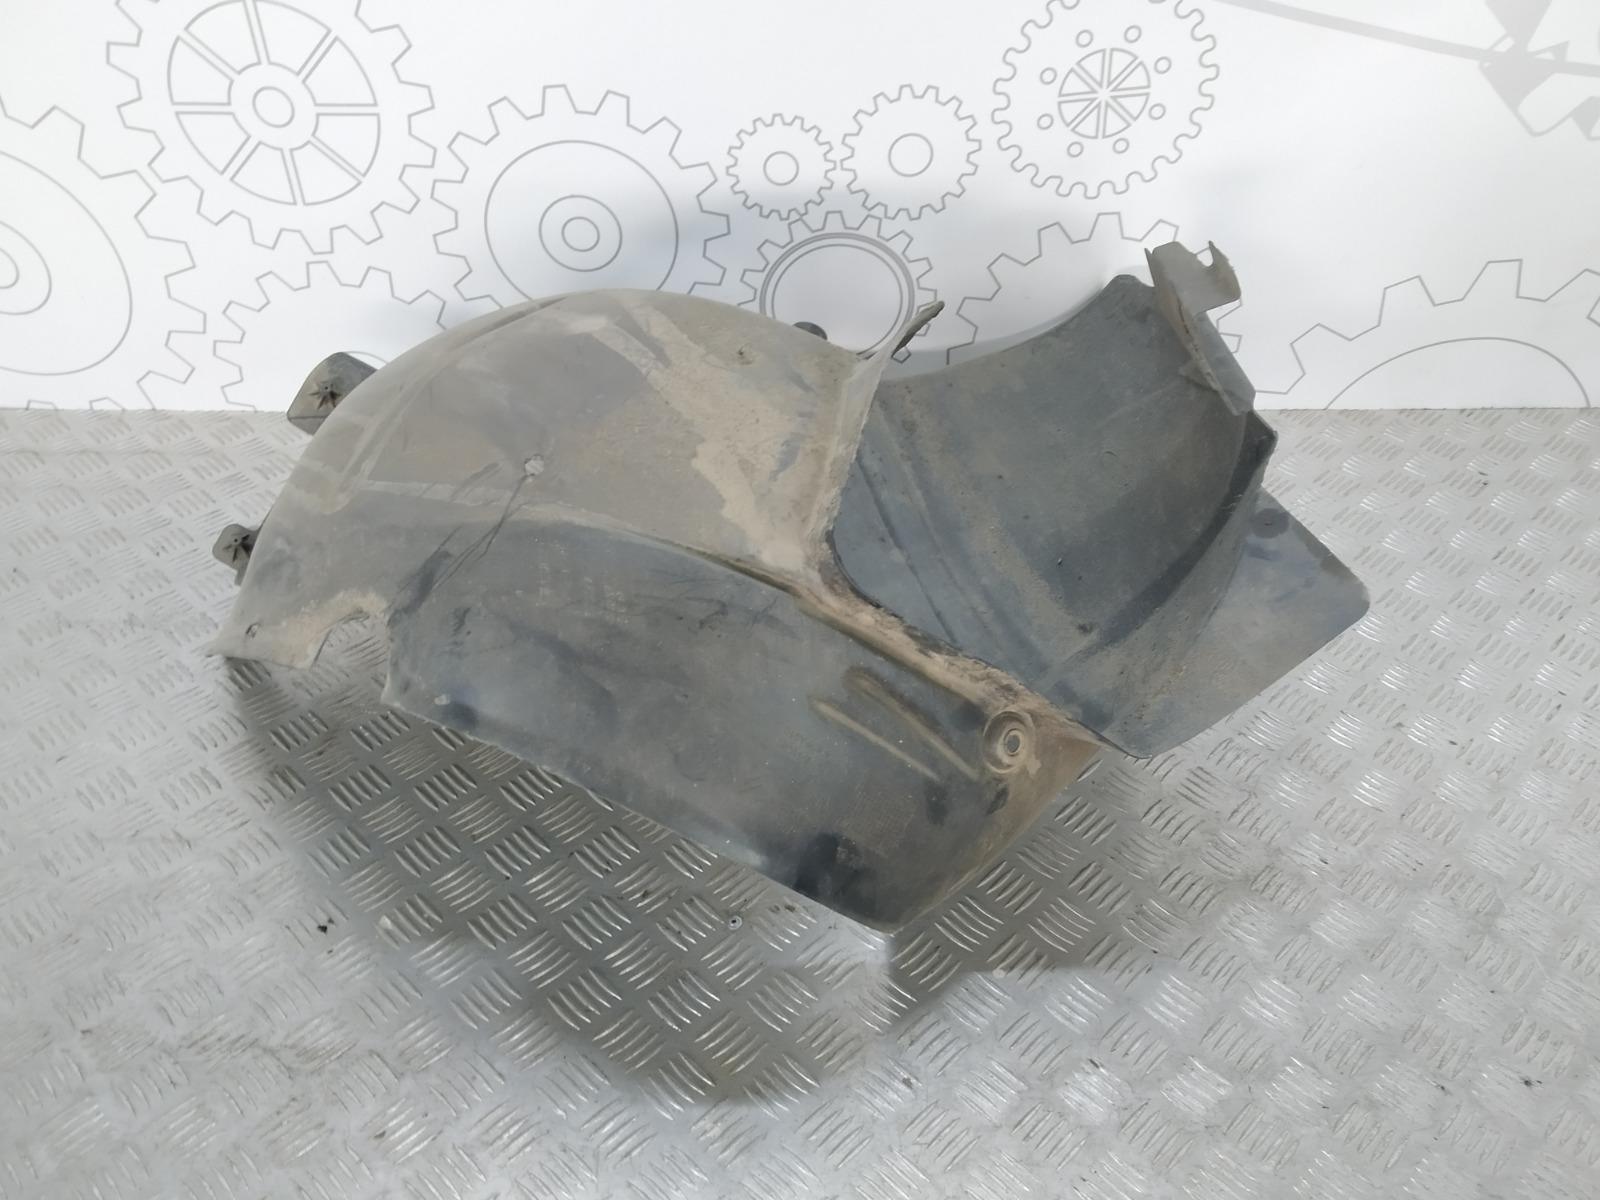 Защита арок передняя левая (подкрылок) Citroen C4 Grand Picasso 2.0 HDI 2007 (б/у)